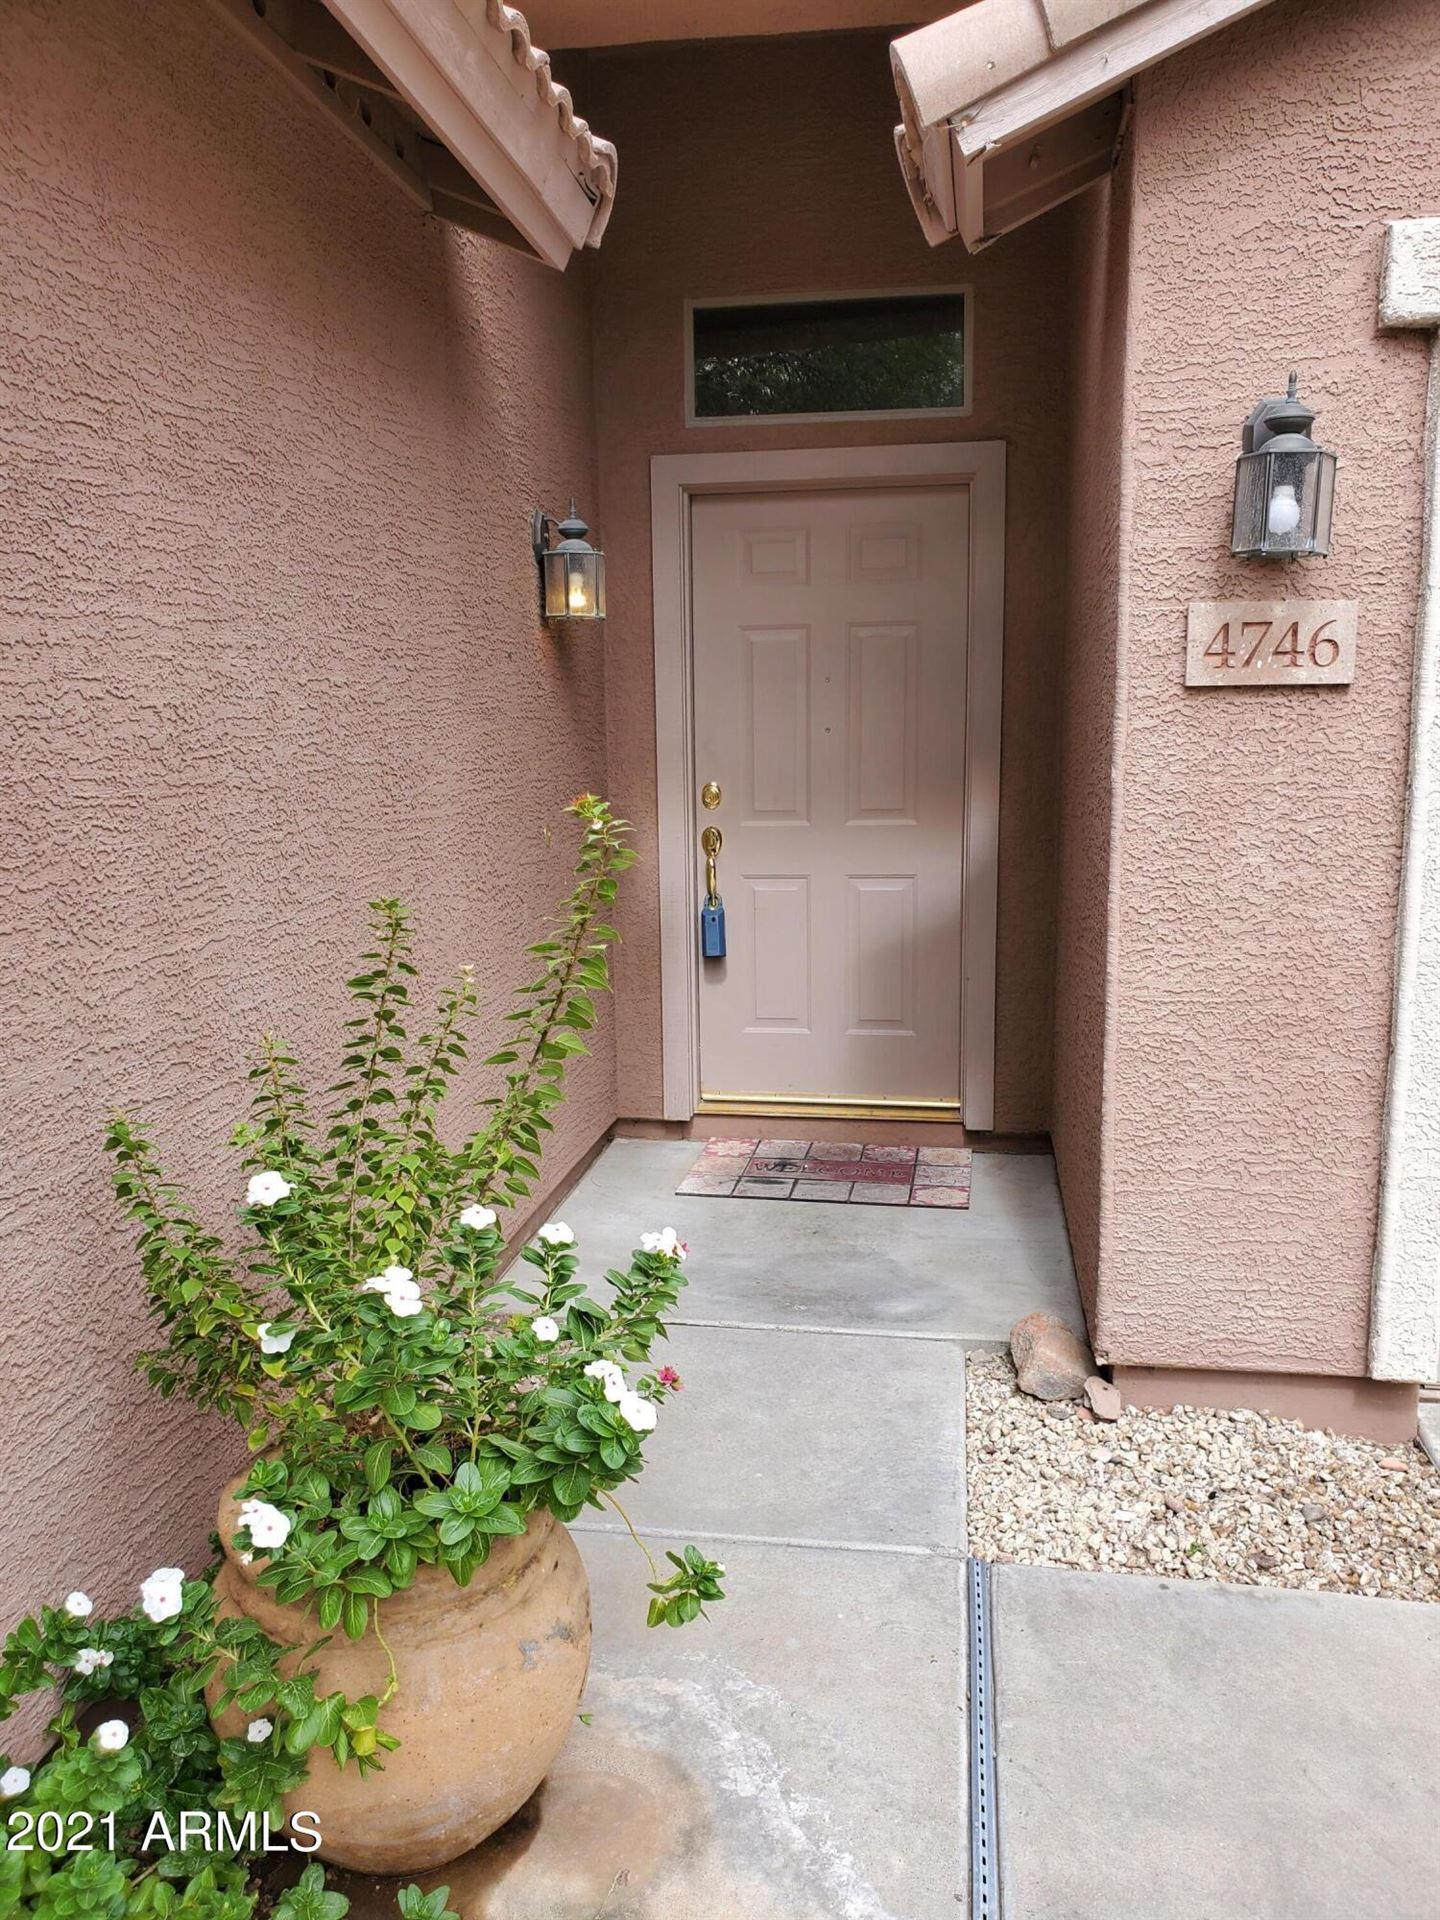 Photo of 4746 E WOBURN Lane, Cave Creek, AZ 85331 (MLS # 6305415)